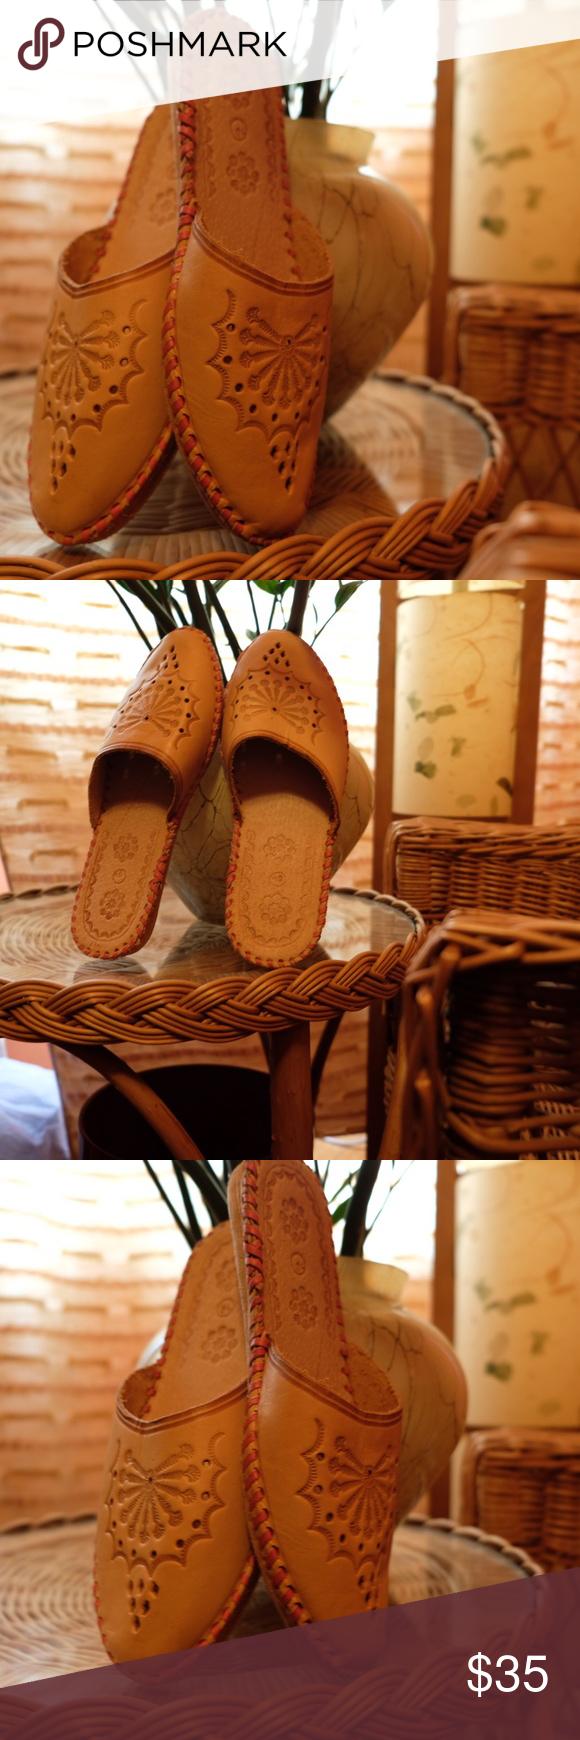 Traditional polish leather slipper on market in Zakopane